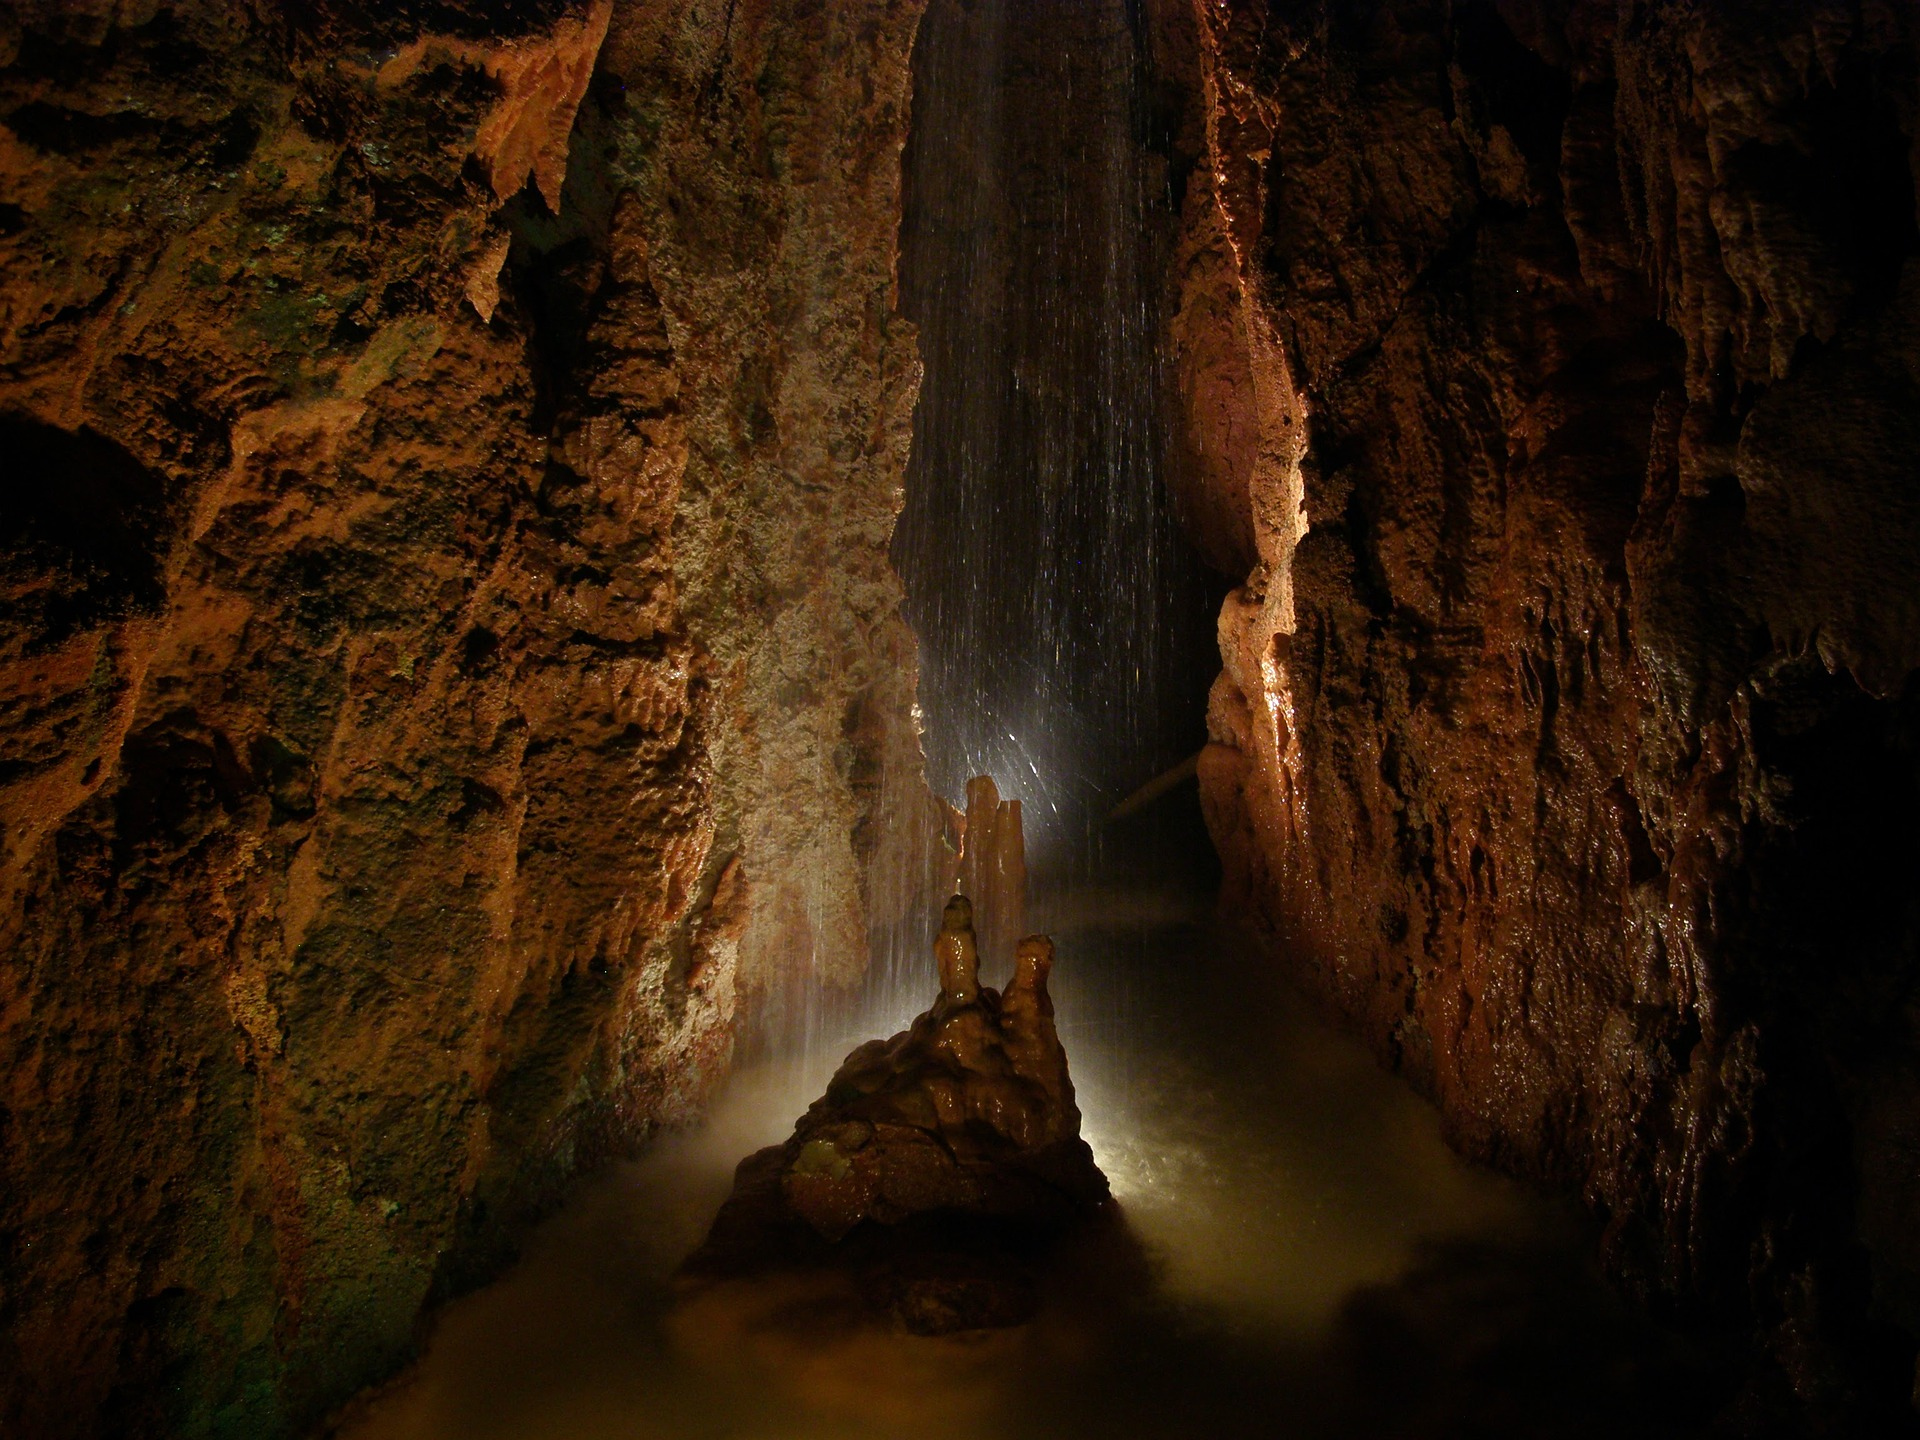 cave 1909324 1920